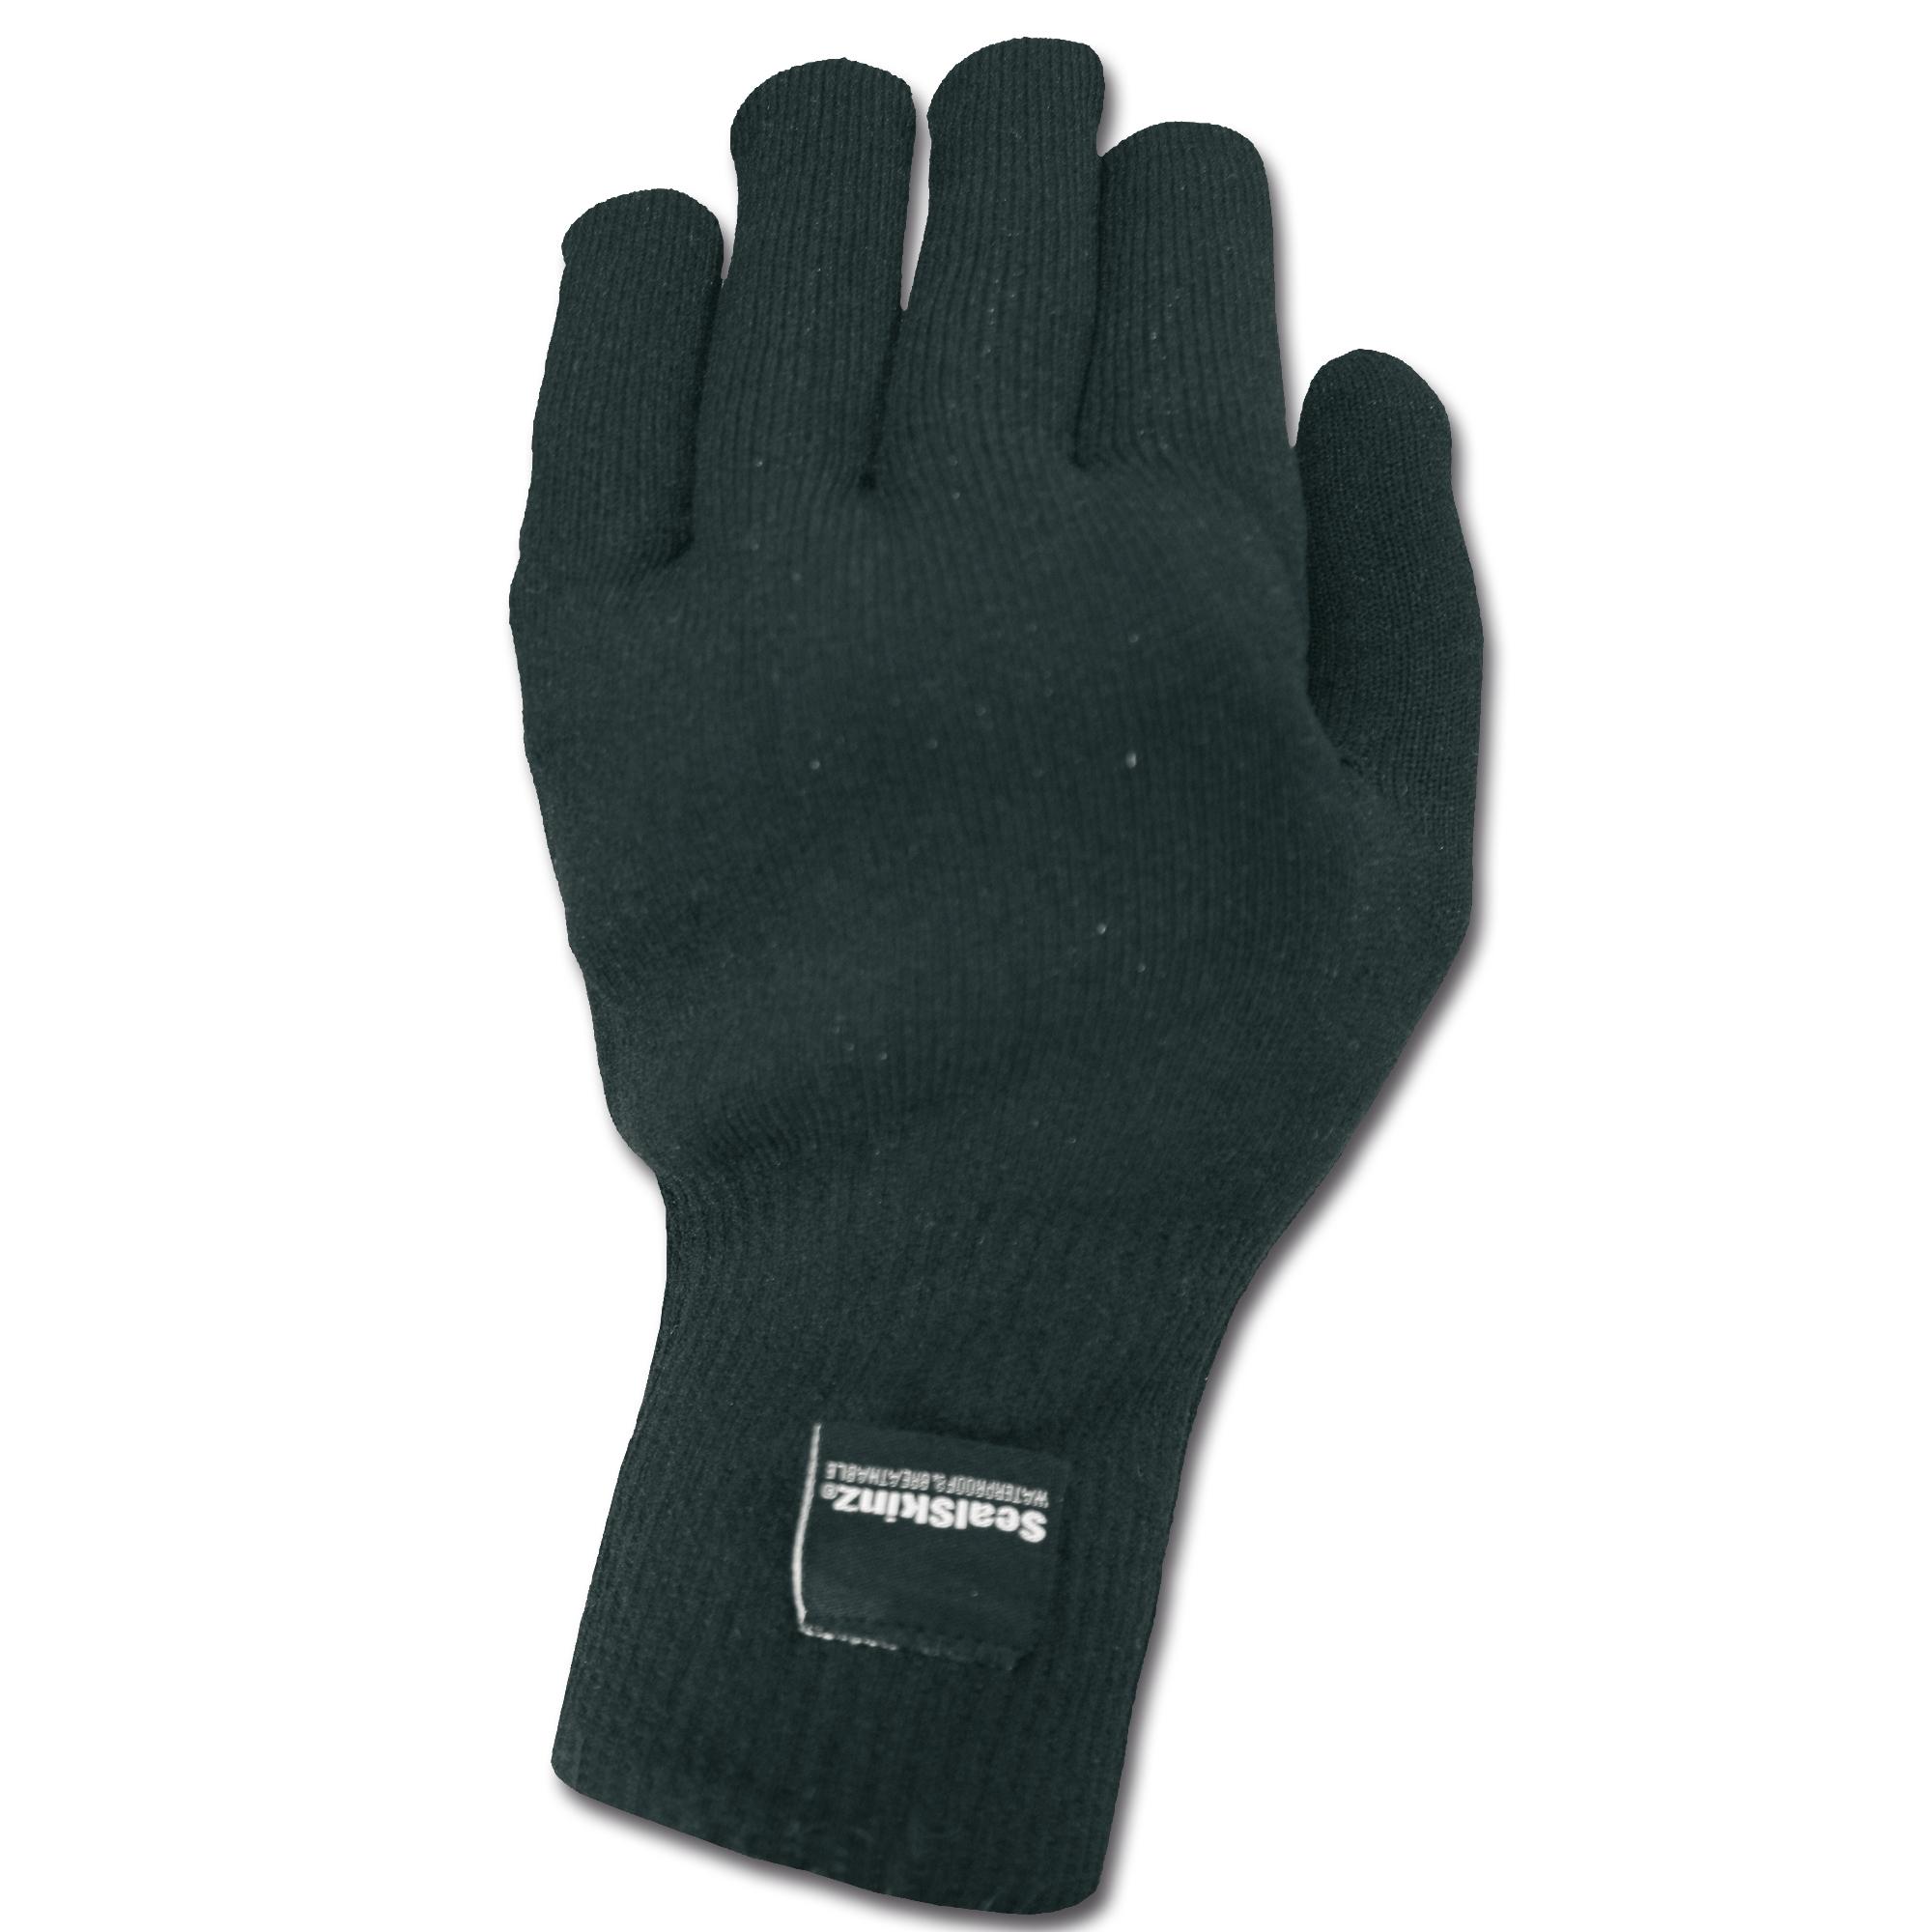 Handschuhe SealSkinz Ultra Grip schwarz